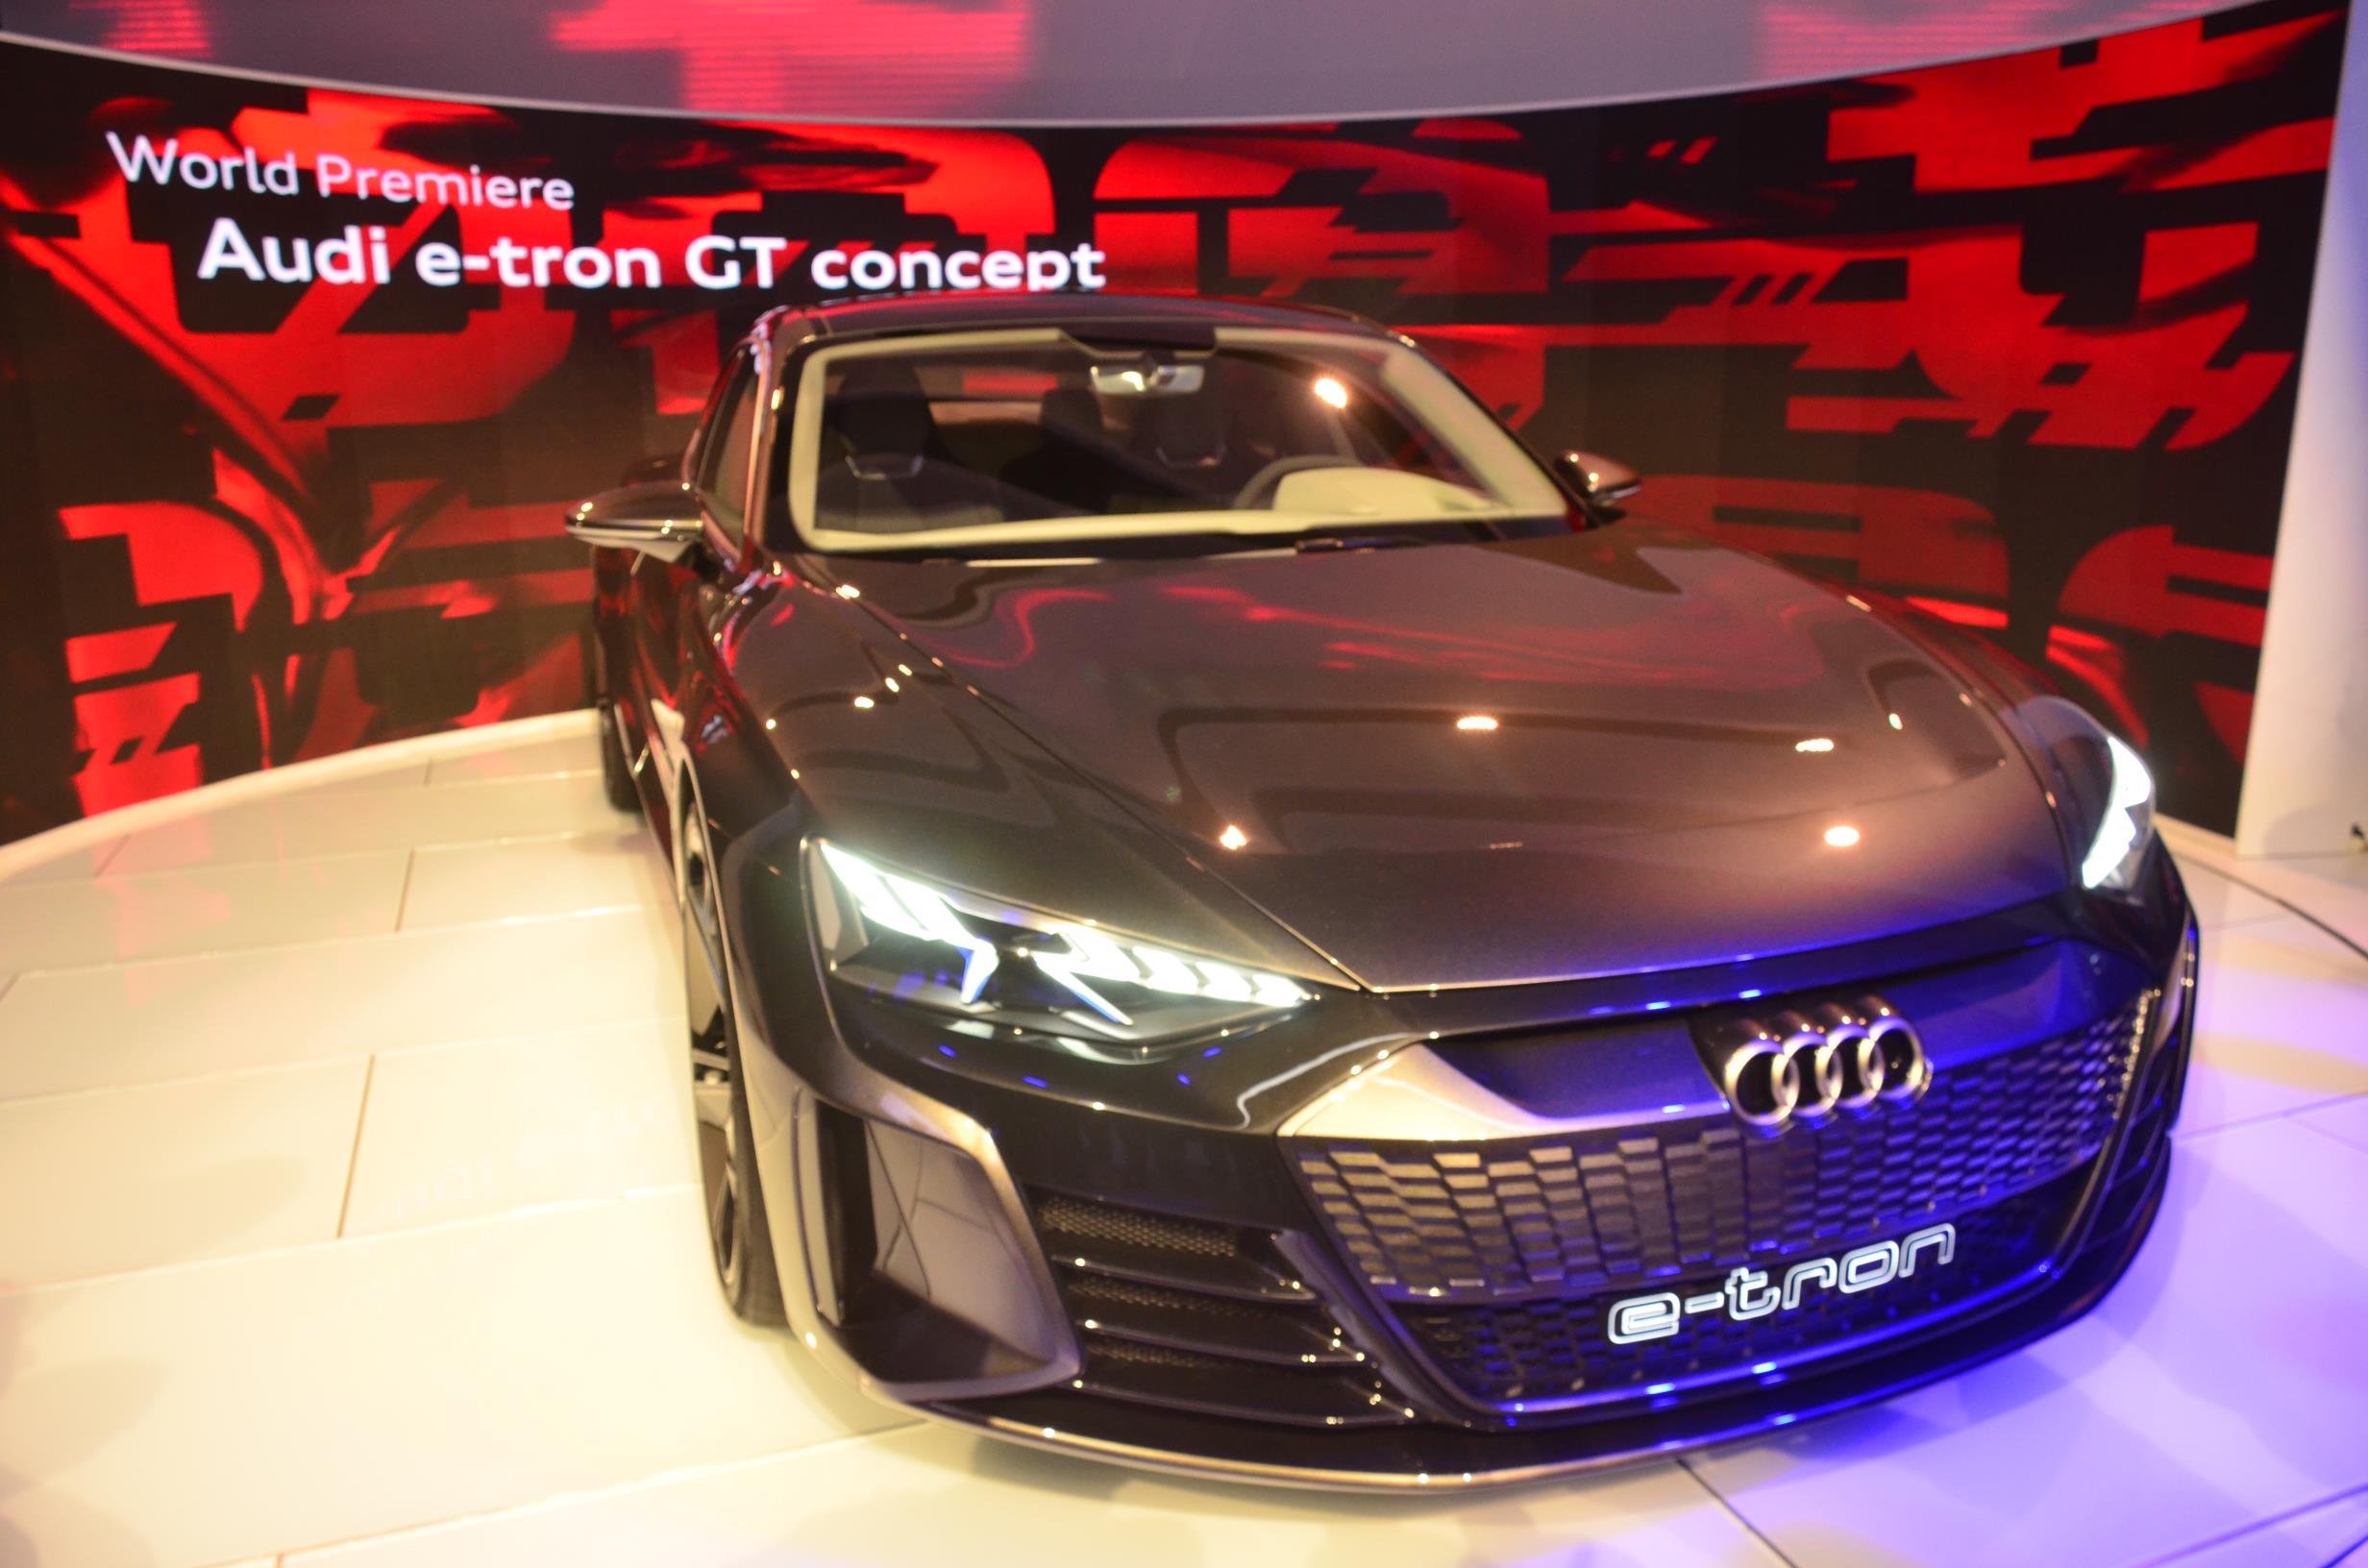 Tony Stark Confirms Audi E Tron Gt For Avengers Endgame Autoevolution